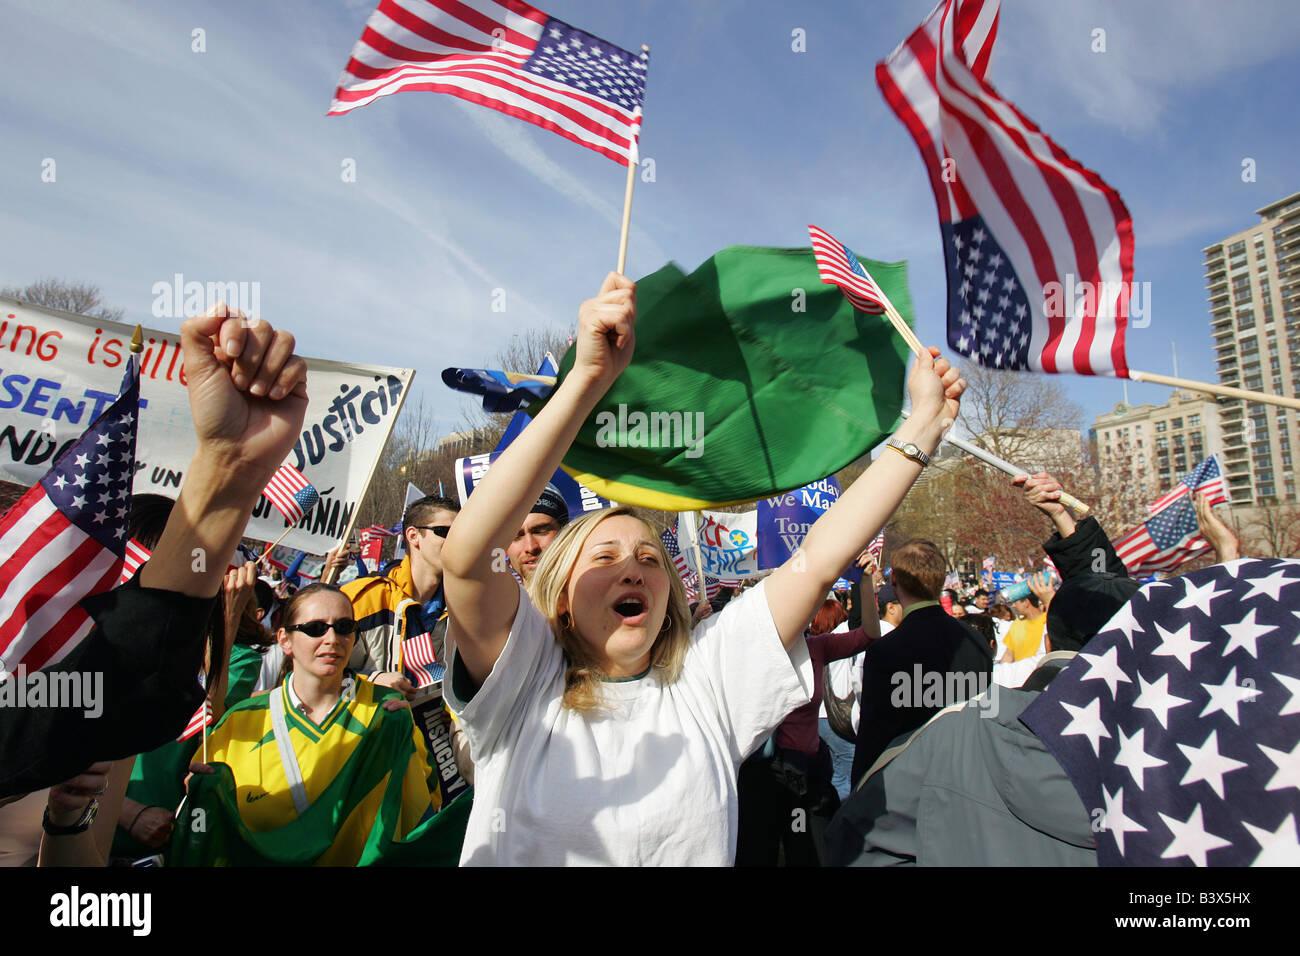 immigrant rally Boston Common - Stock Image